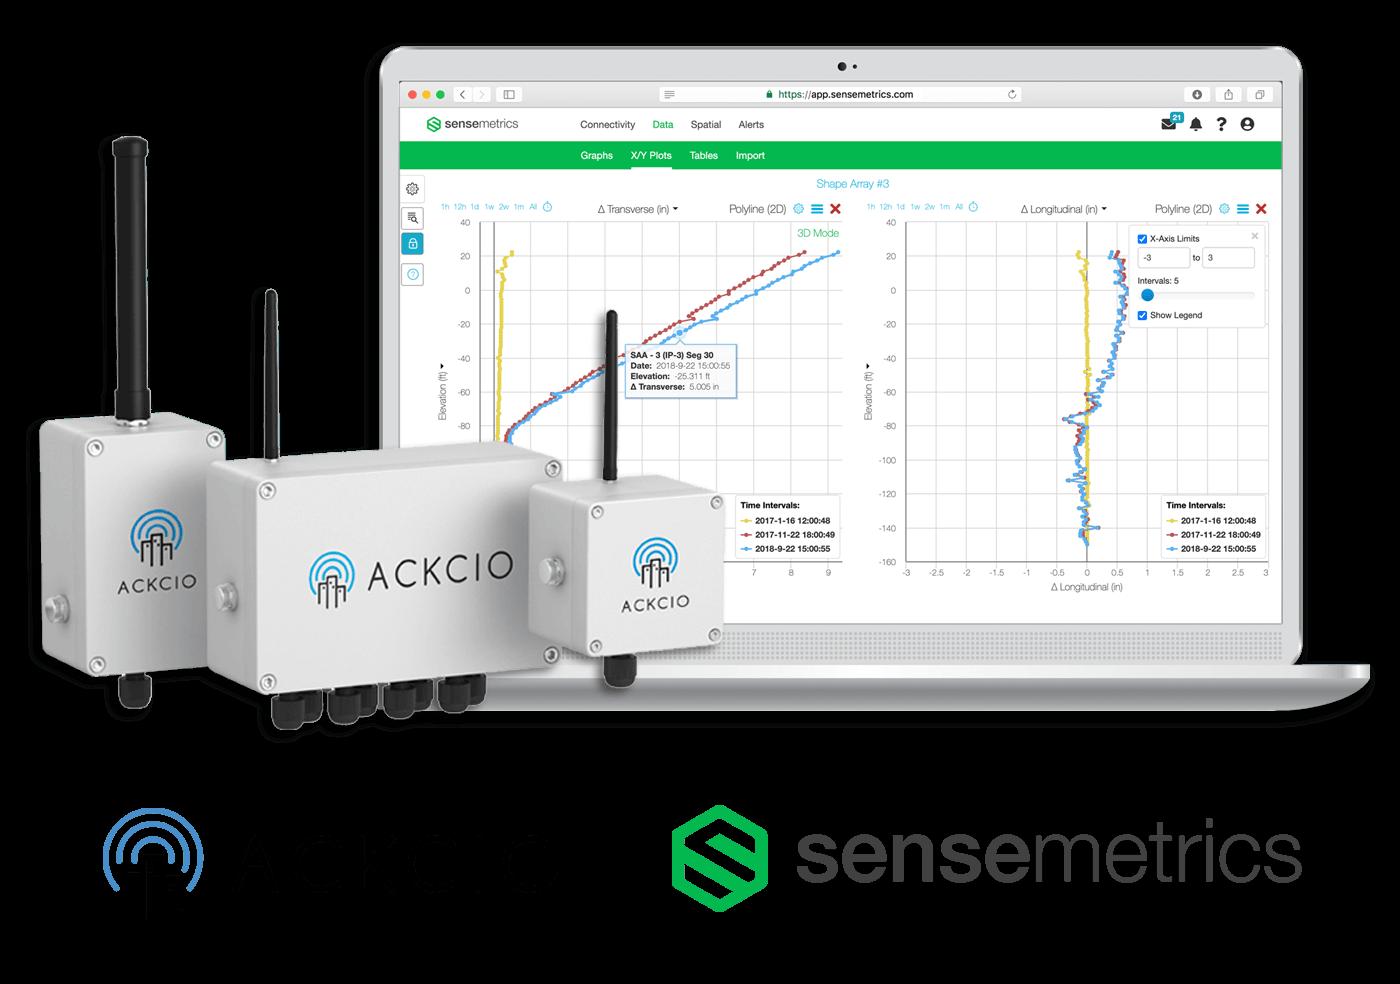 sensemetrics Joins Forces with Ackcio